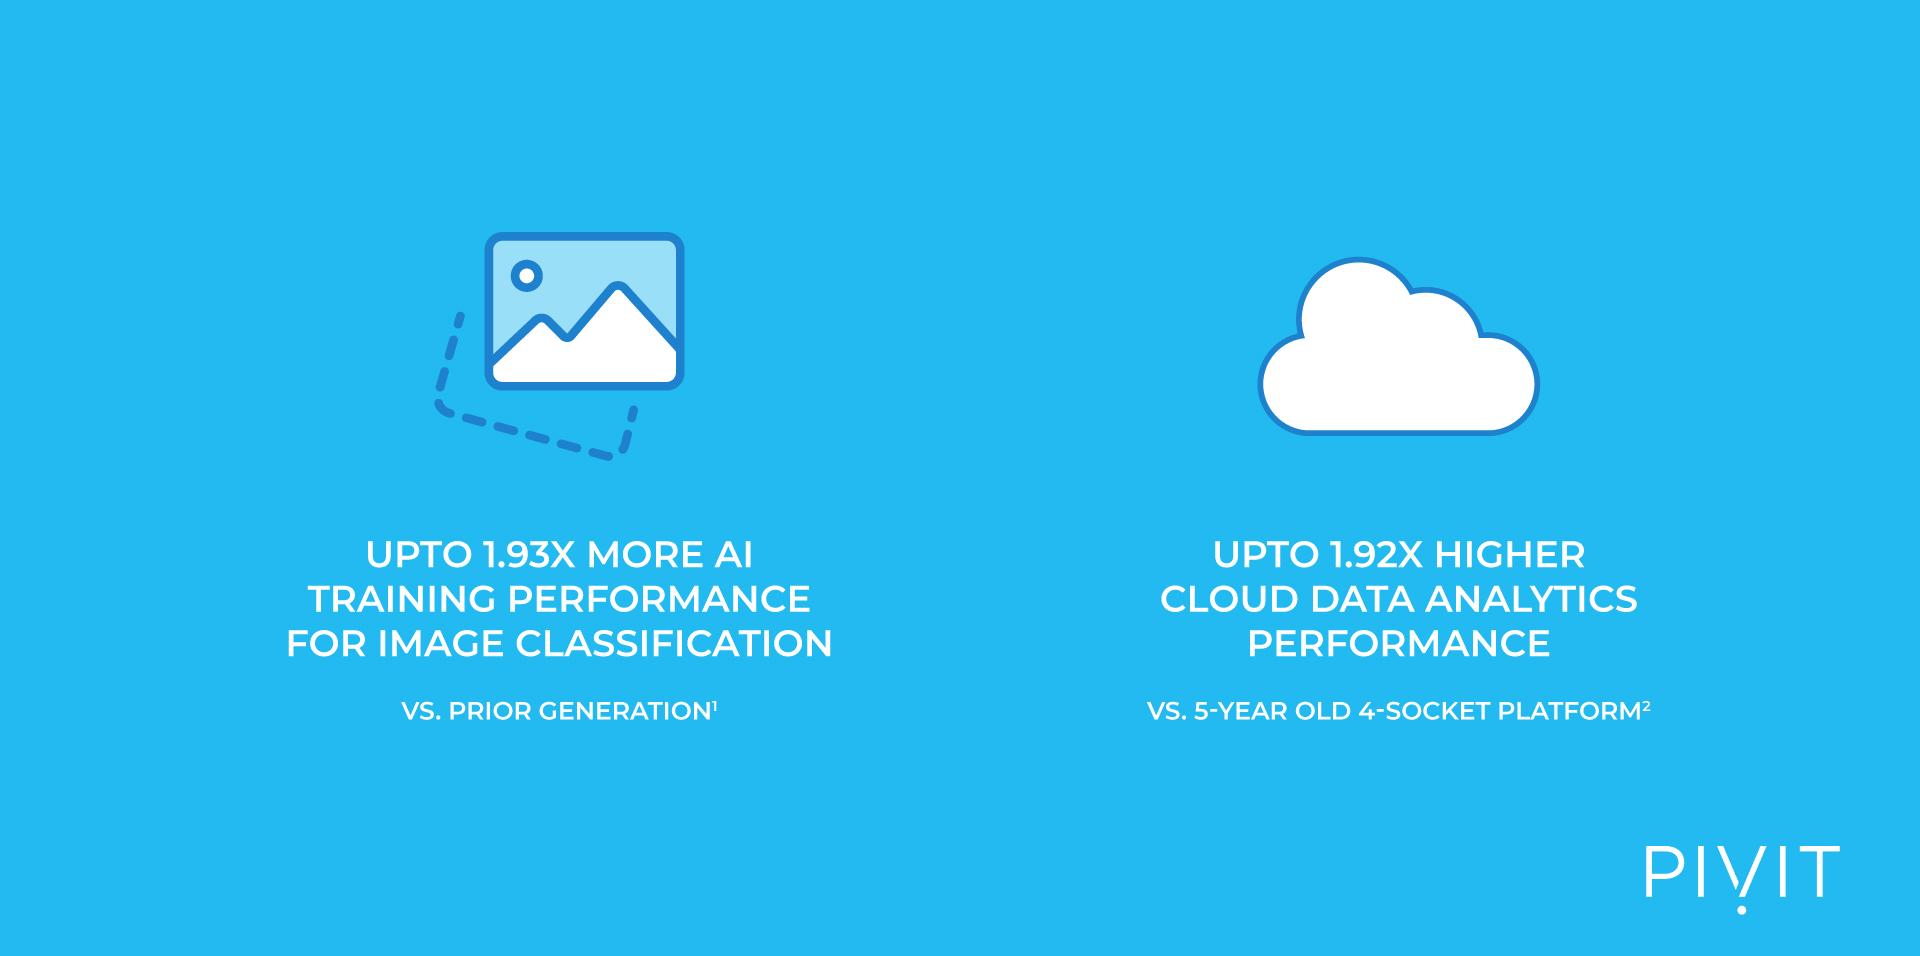 Third generation Intel Xeon Scalable Processors (Ice Lake) performance indicators